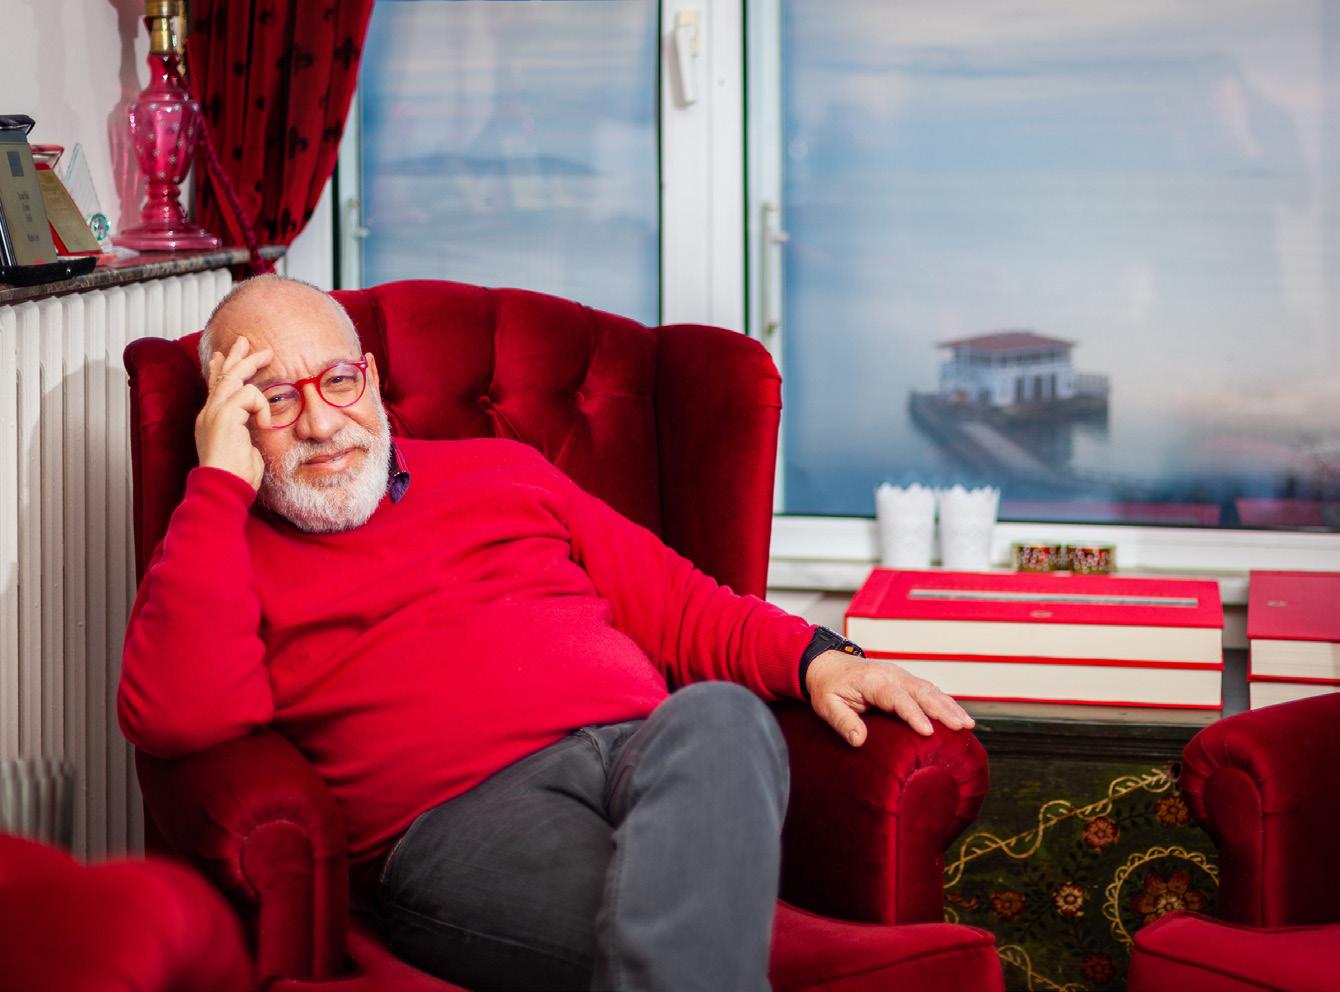 Mario Levi Tramvay Durağındaki Sohbetten Doğan Roman